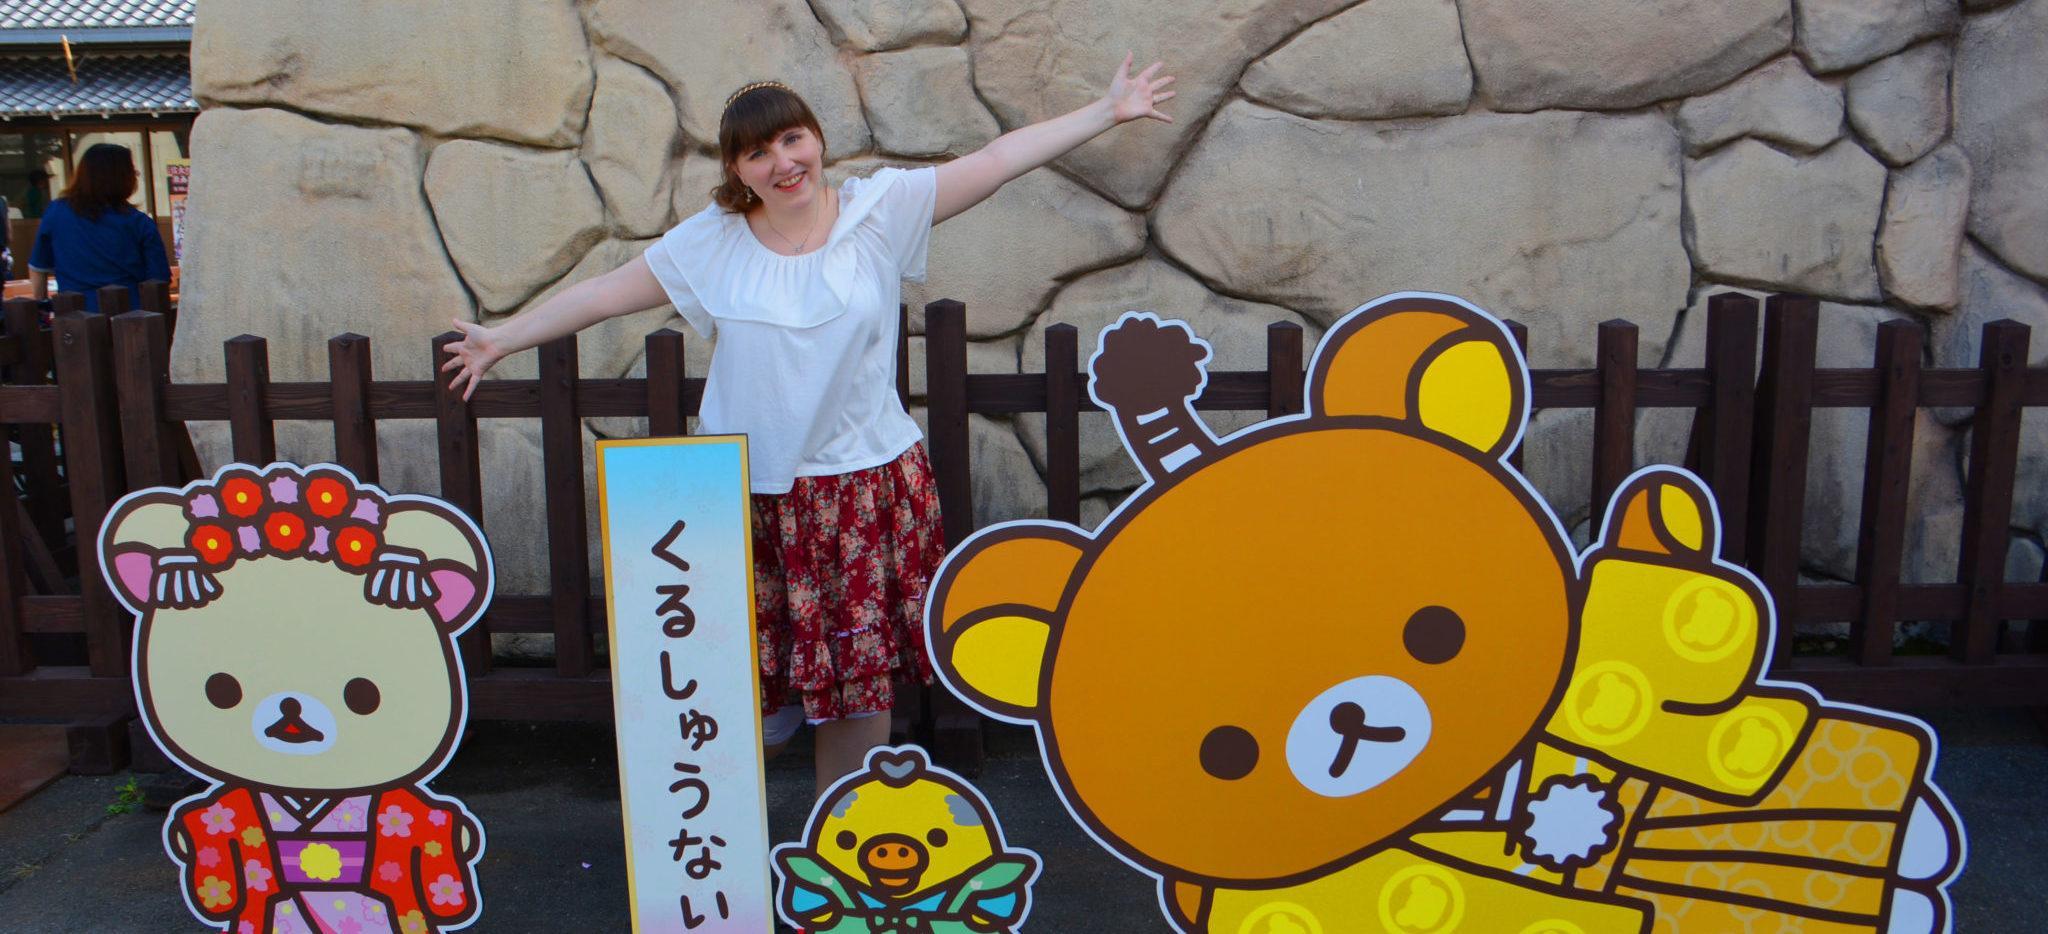 Nach Japan auswandern: Claudias Erfahrung